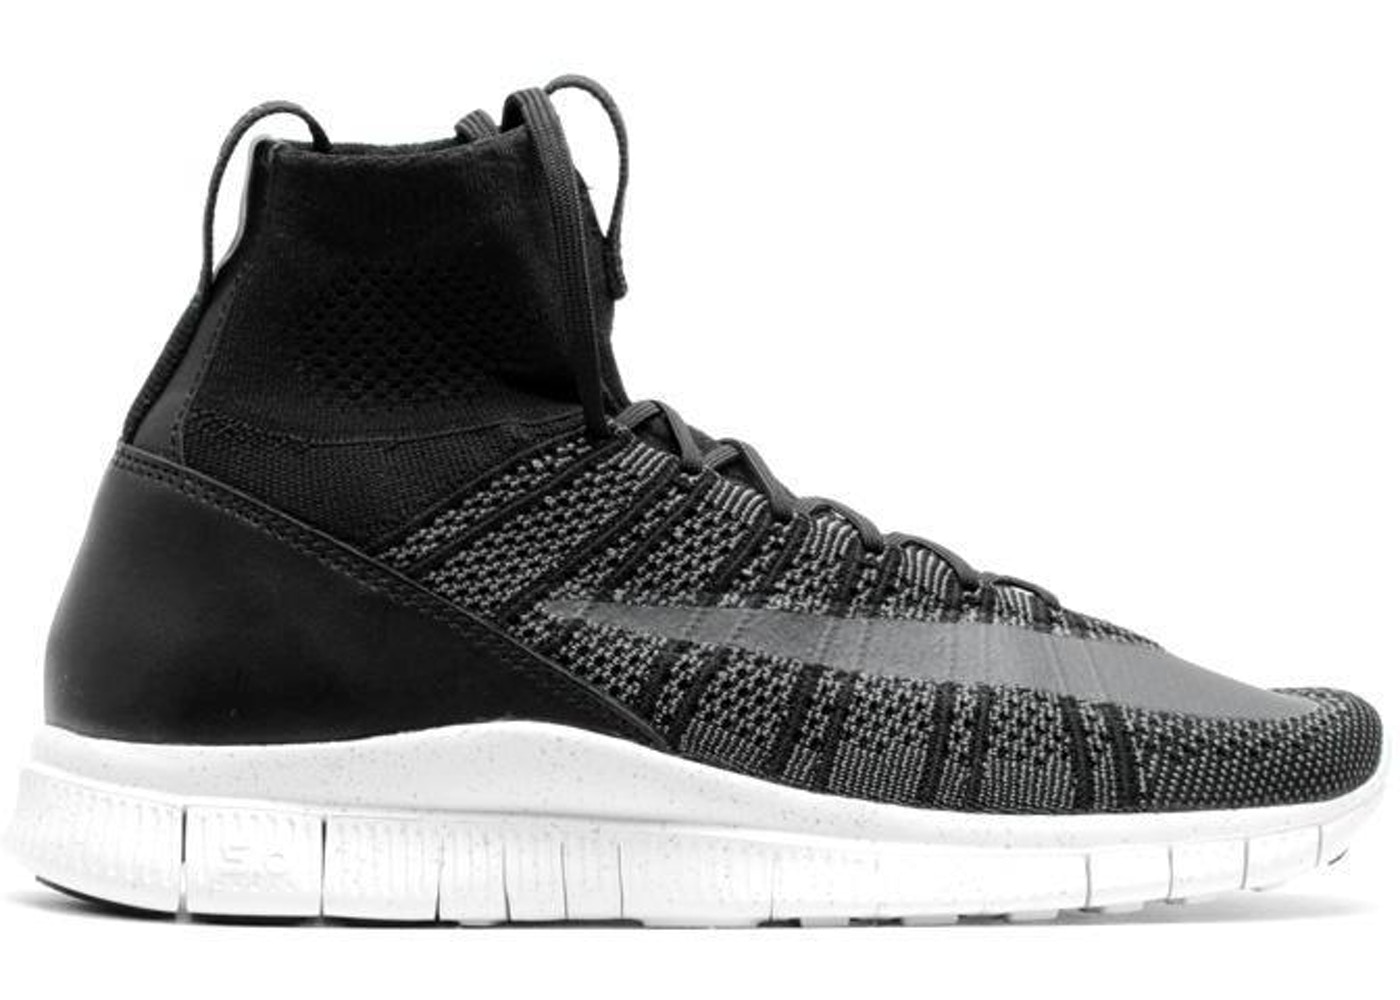 buy popular d5b80 b6670 Nike HTM Superfly Mercurial Black - 667978-001